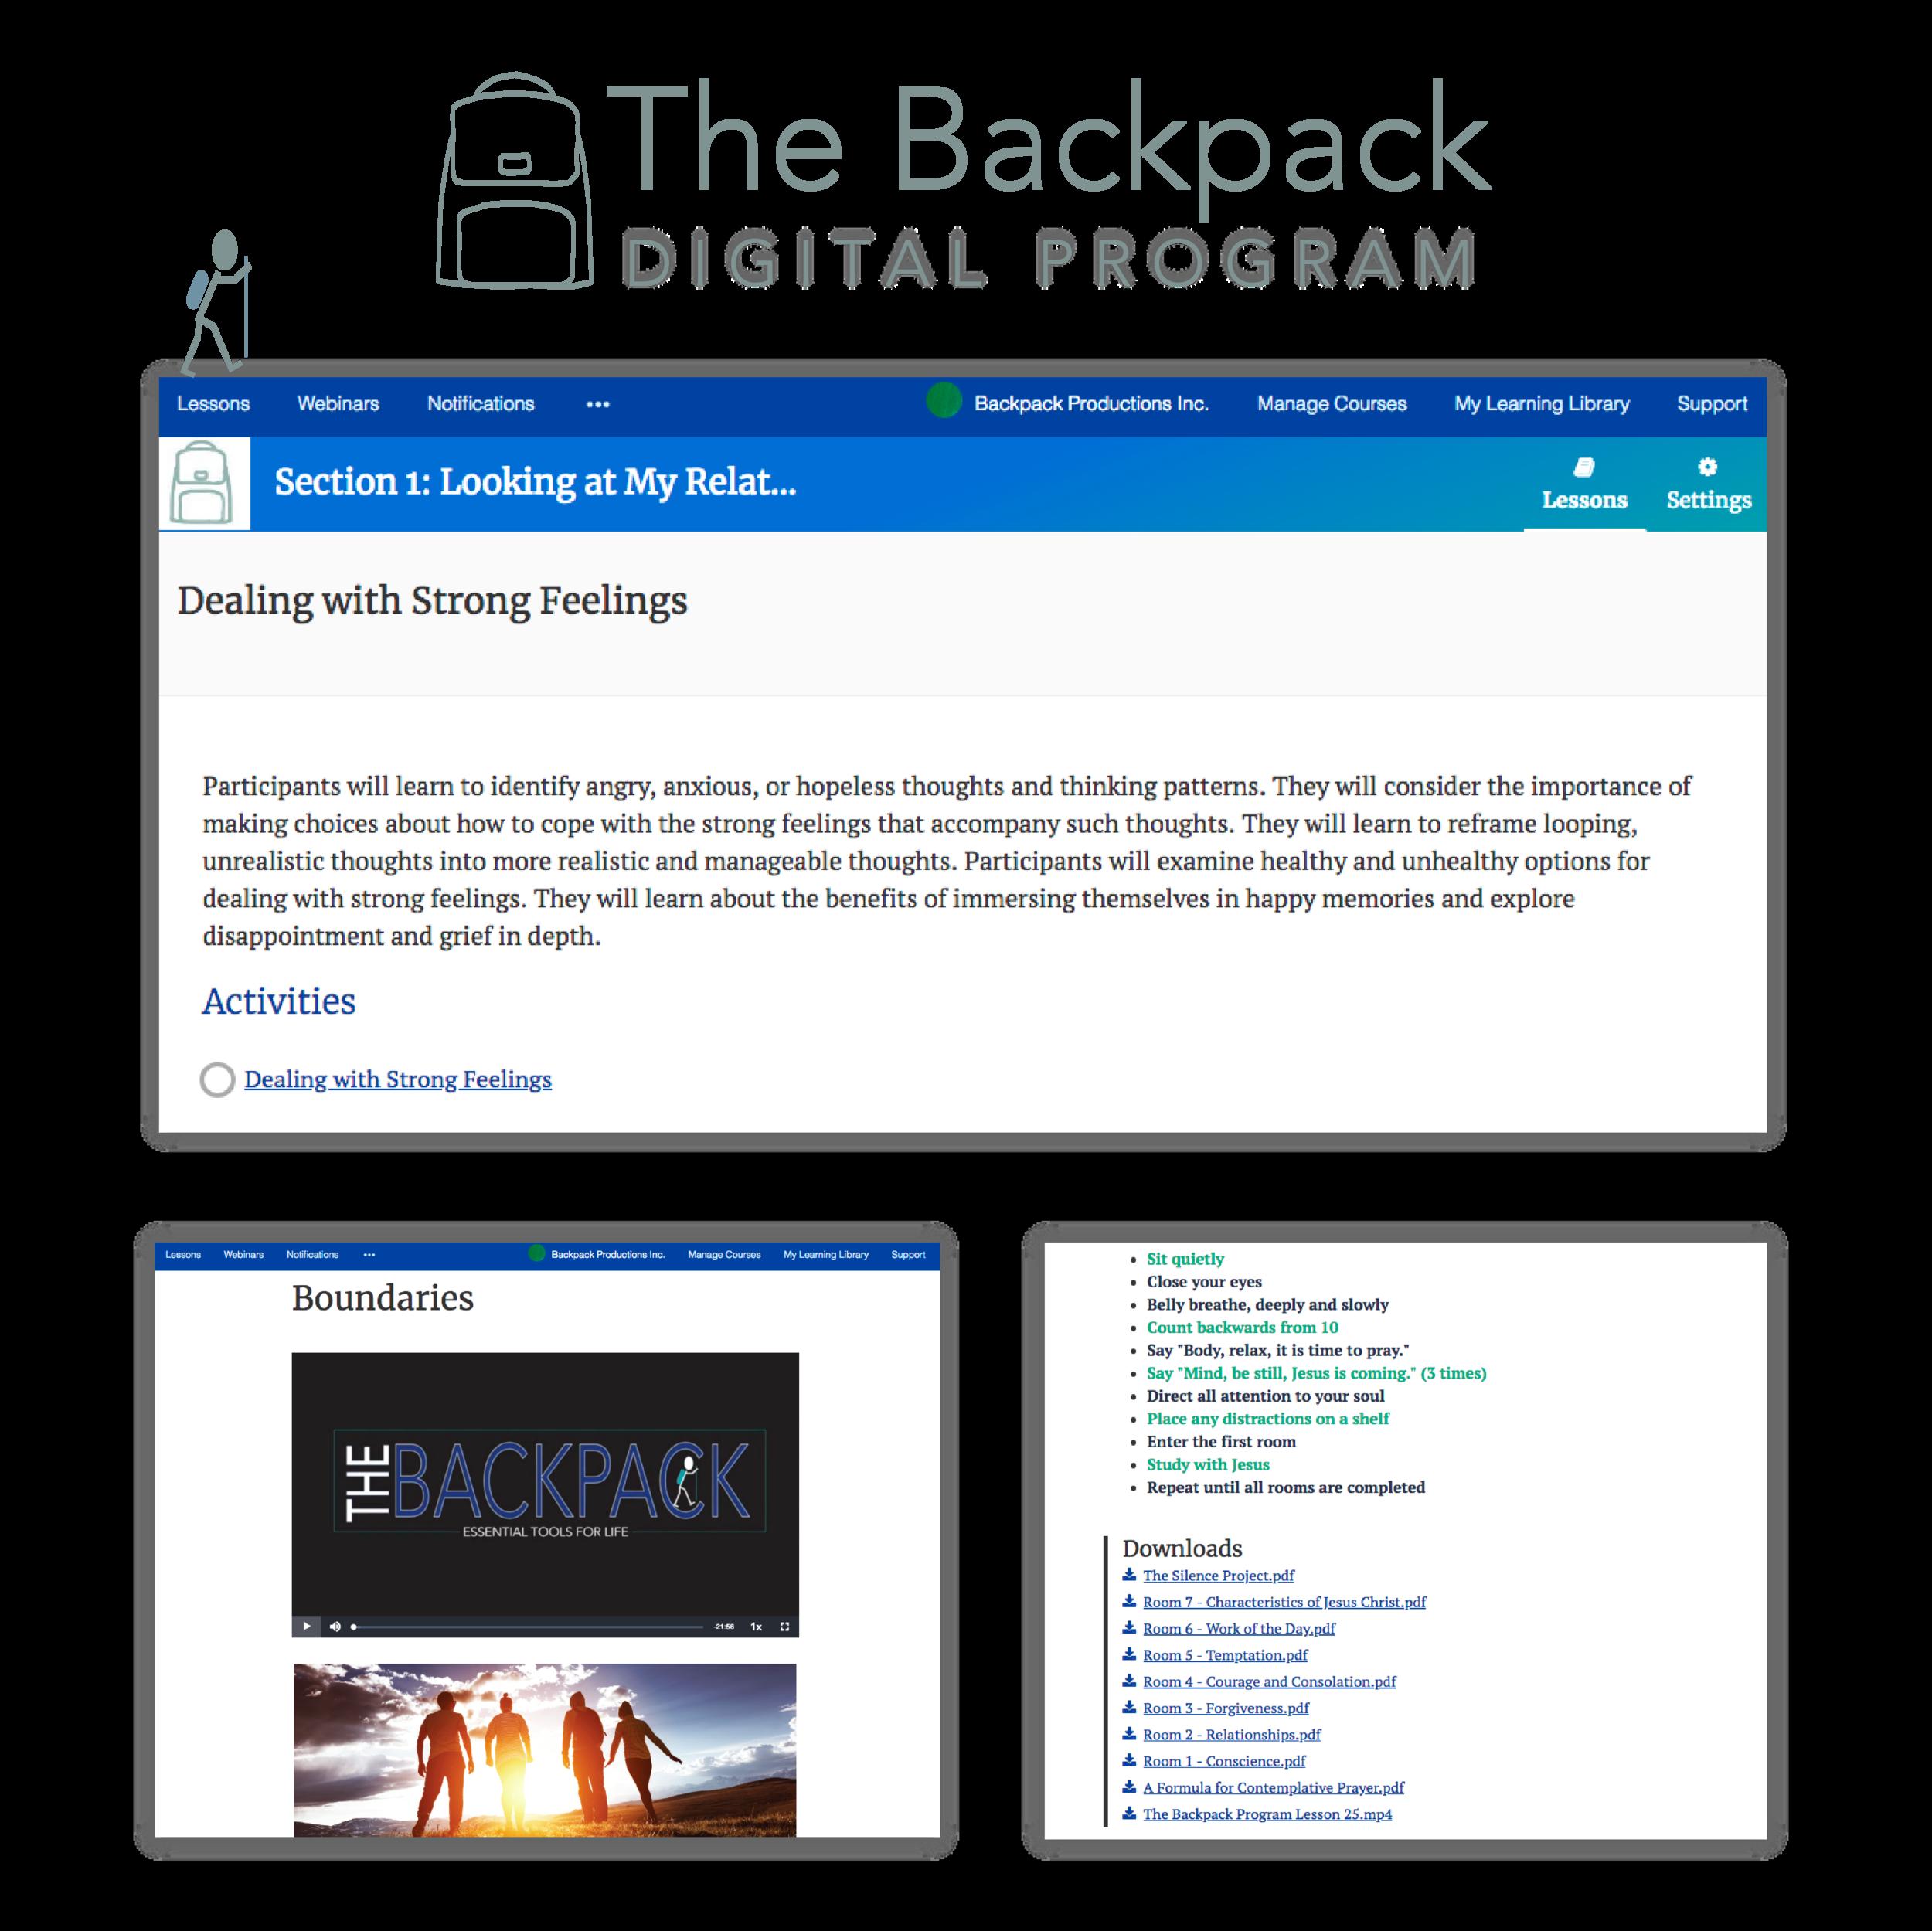 Backpack_DigitalProgram-01.png